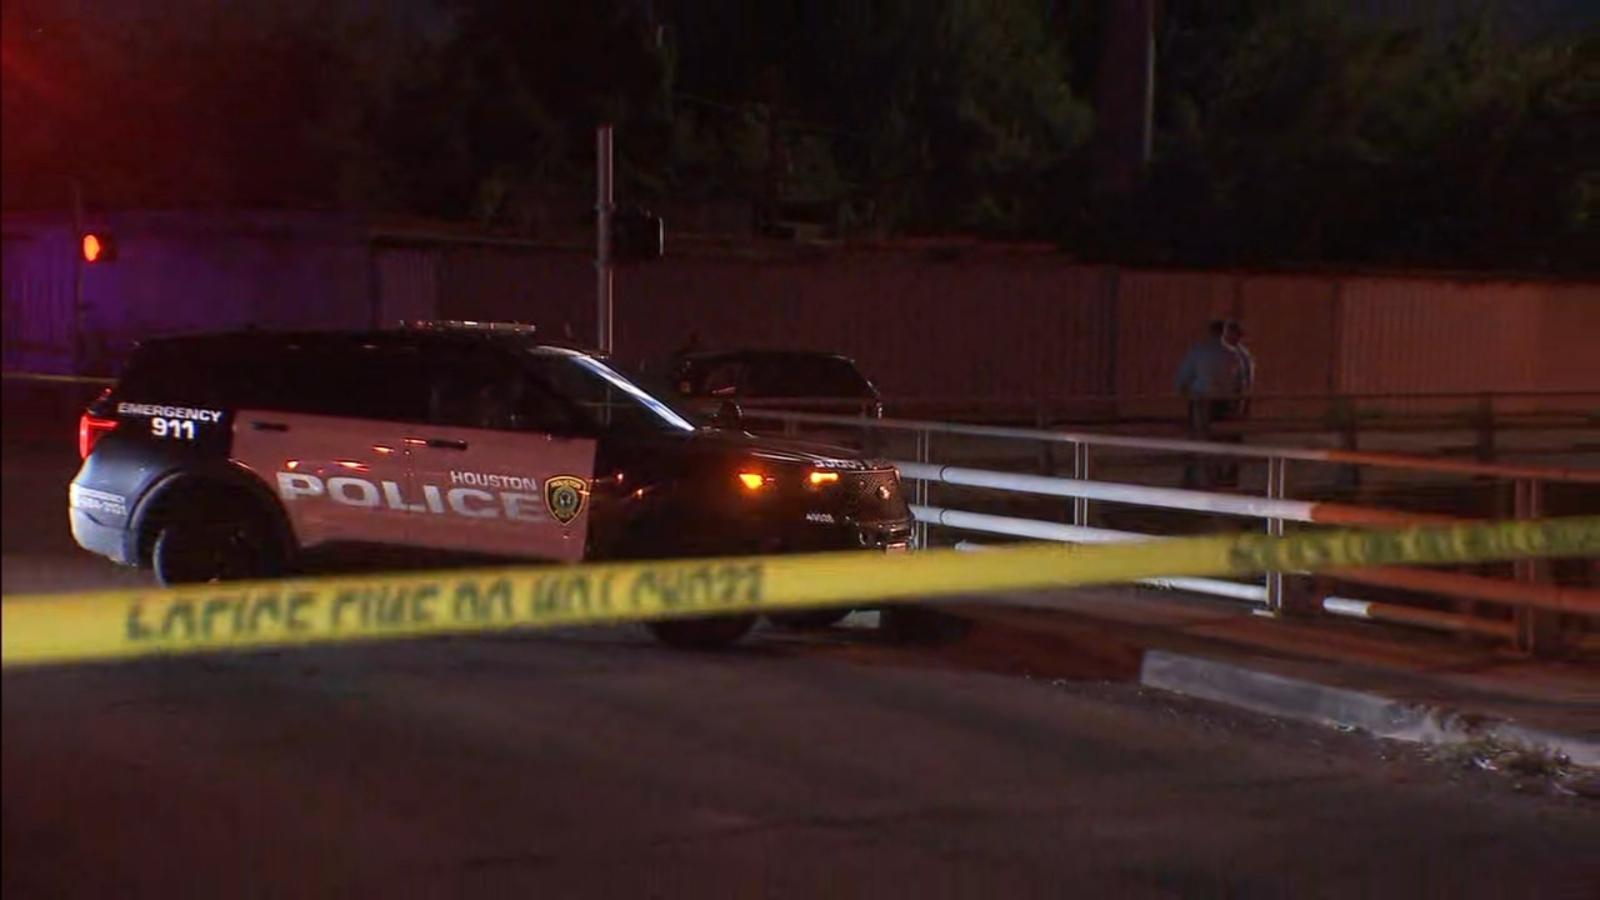 Man shot, killed in apparent road rage